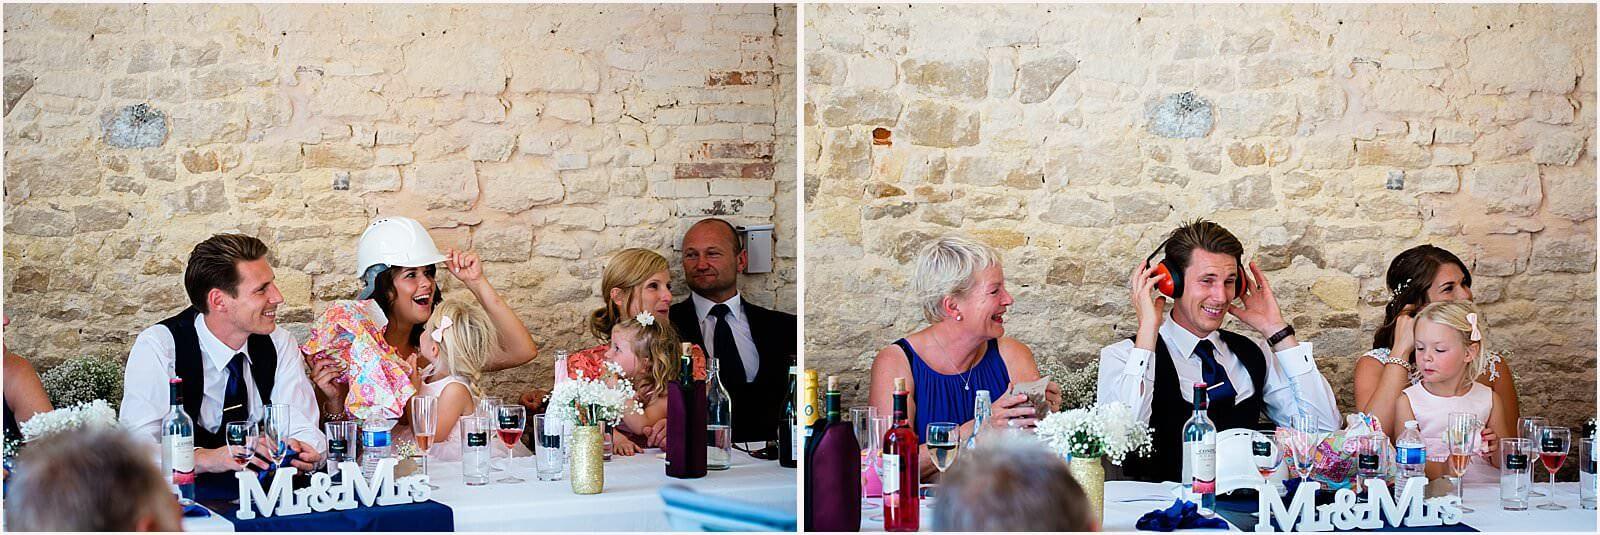 Chateau de Courtomer Wedding | Chantel & Evan 50